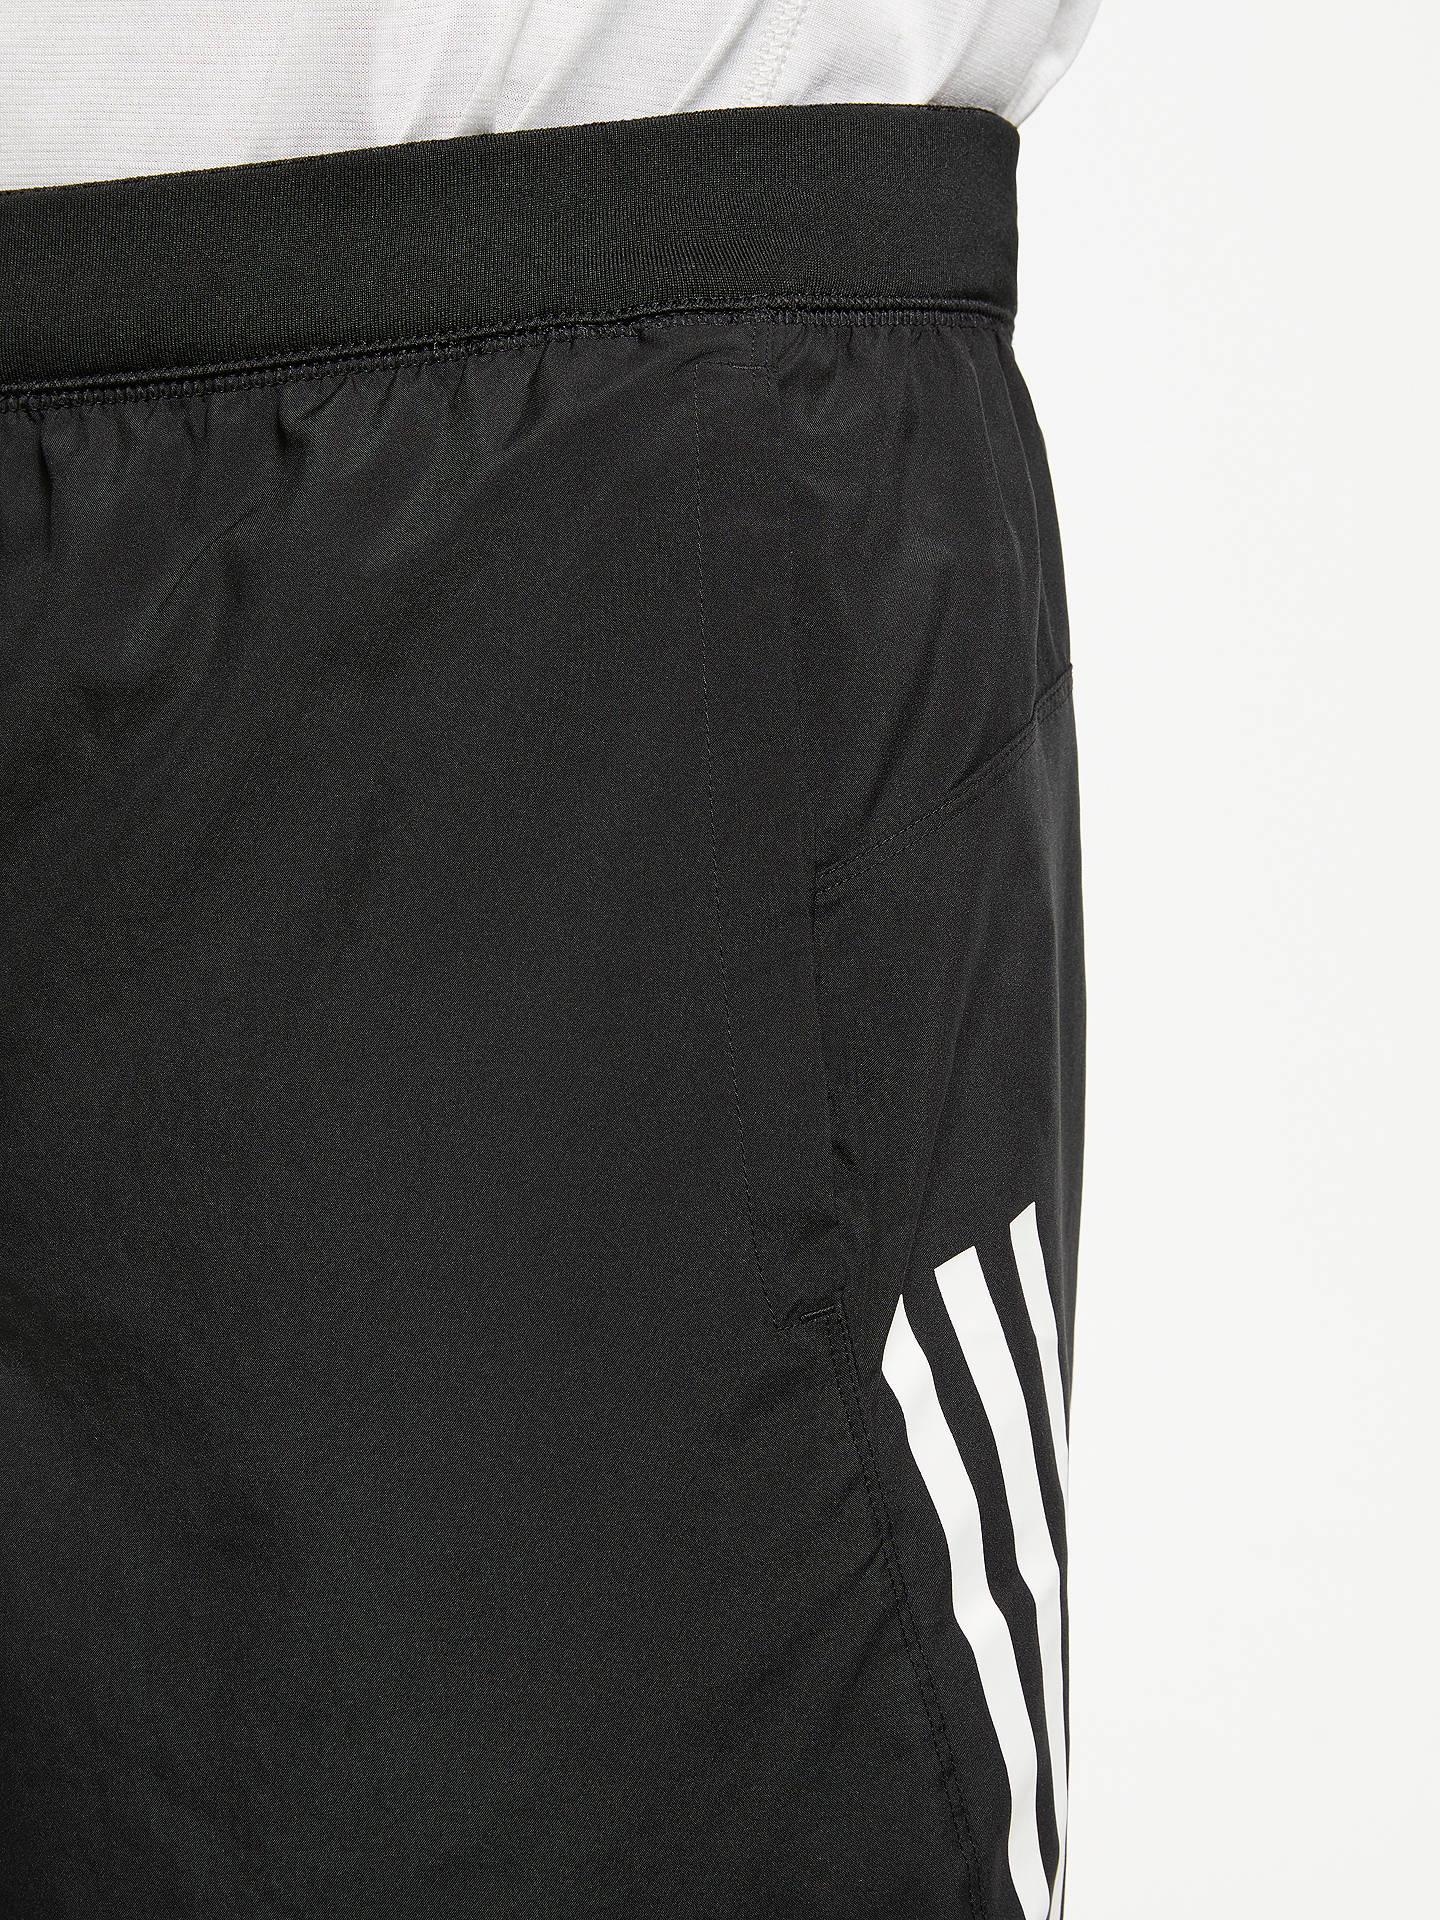 43688a9f05 adidas 4KRFT Tech Woven 3-Stripes Training Shorts, Black